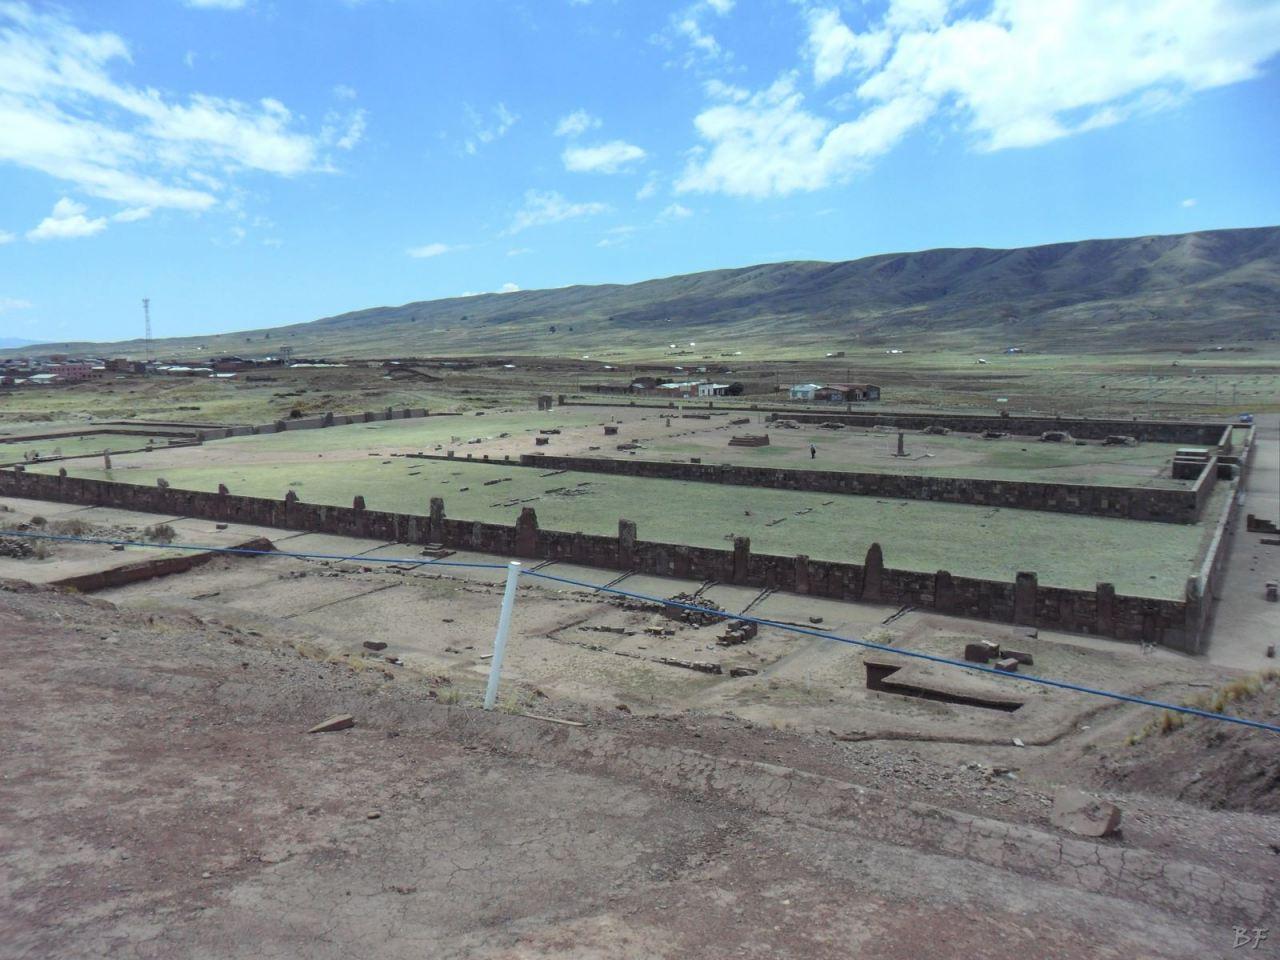 Sito-Megalitico-Piramide-Akapana-Kalasasaya-Menhir-Tiahuanaco-Bolivia-129